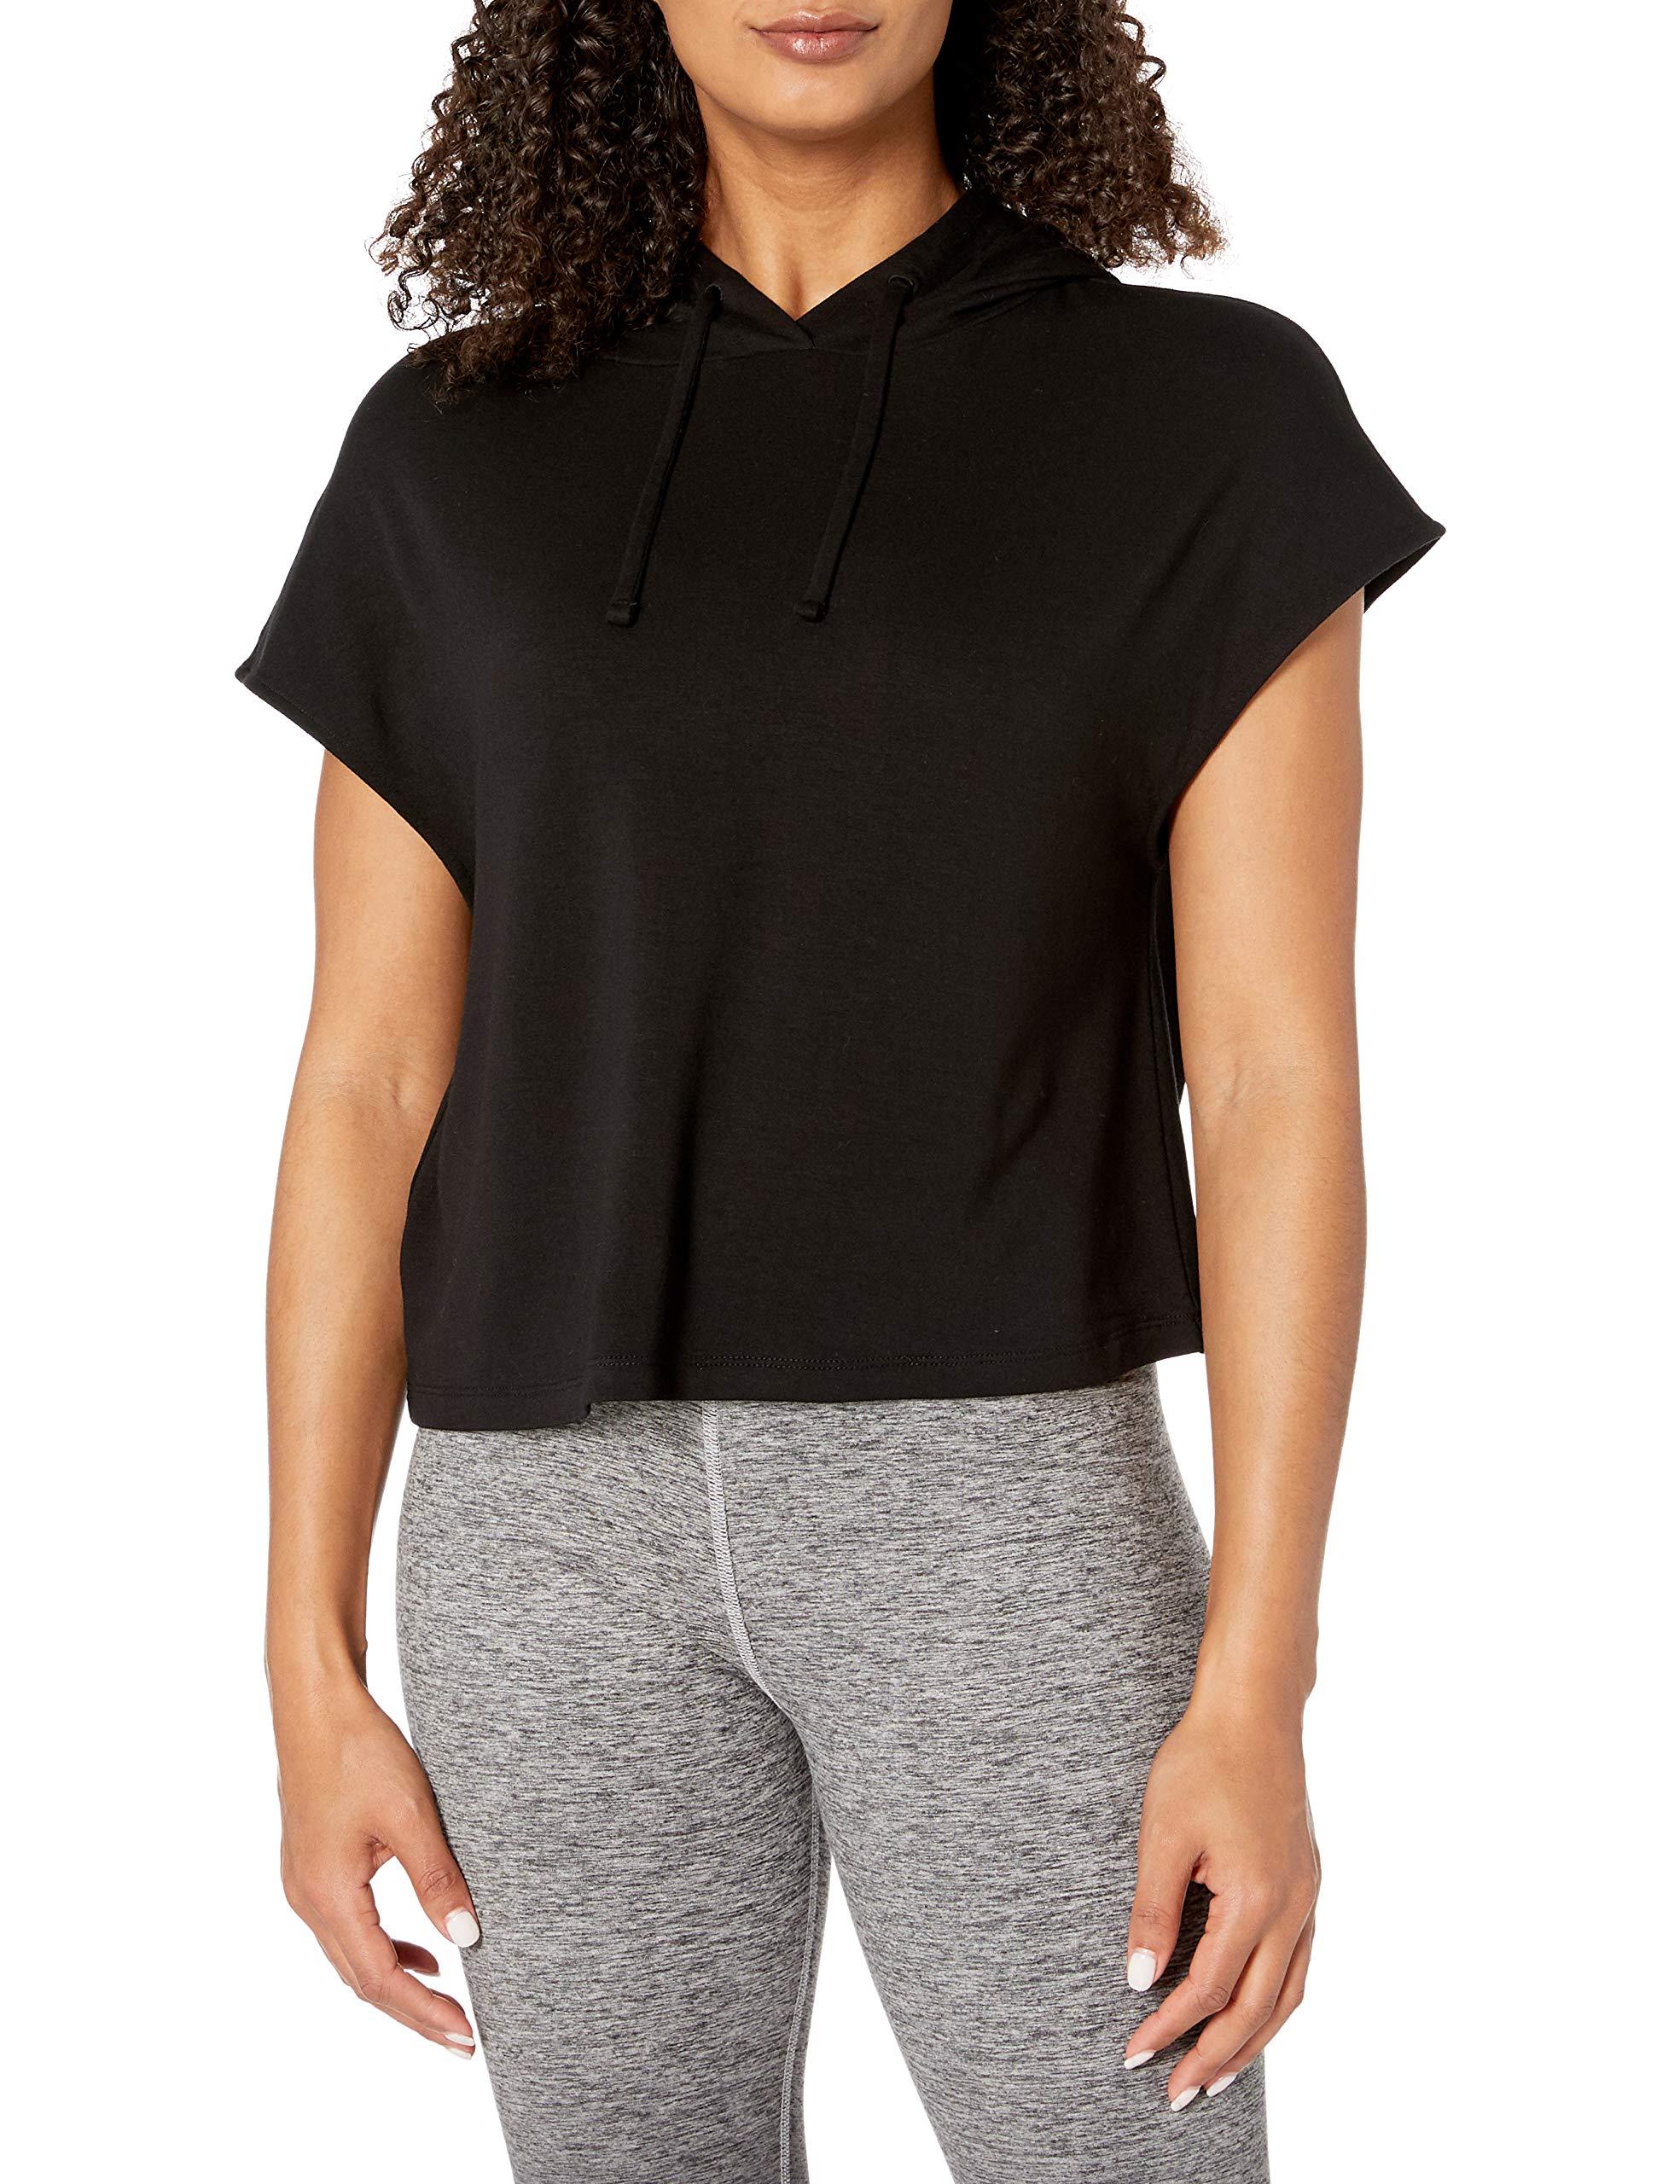 Amazon Brand - Core 10 Women's Soft French Terry Cropped Sleeveless Hoodie Yoga Sweatshirt